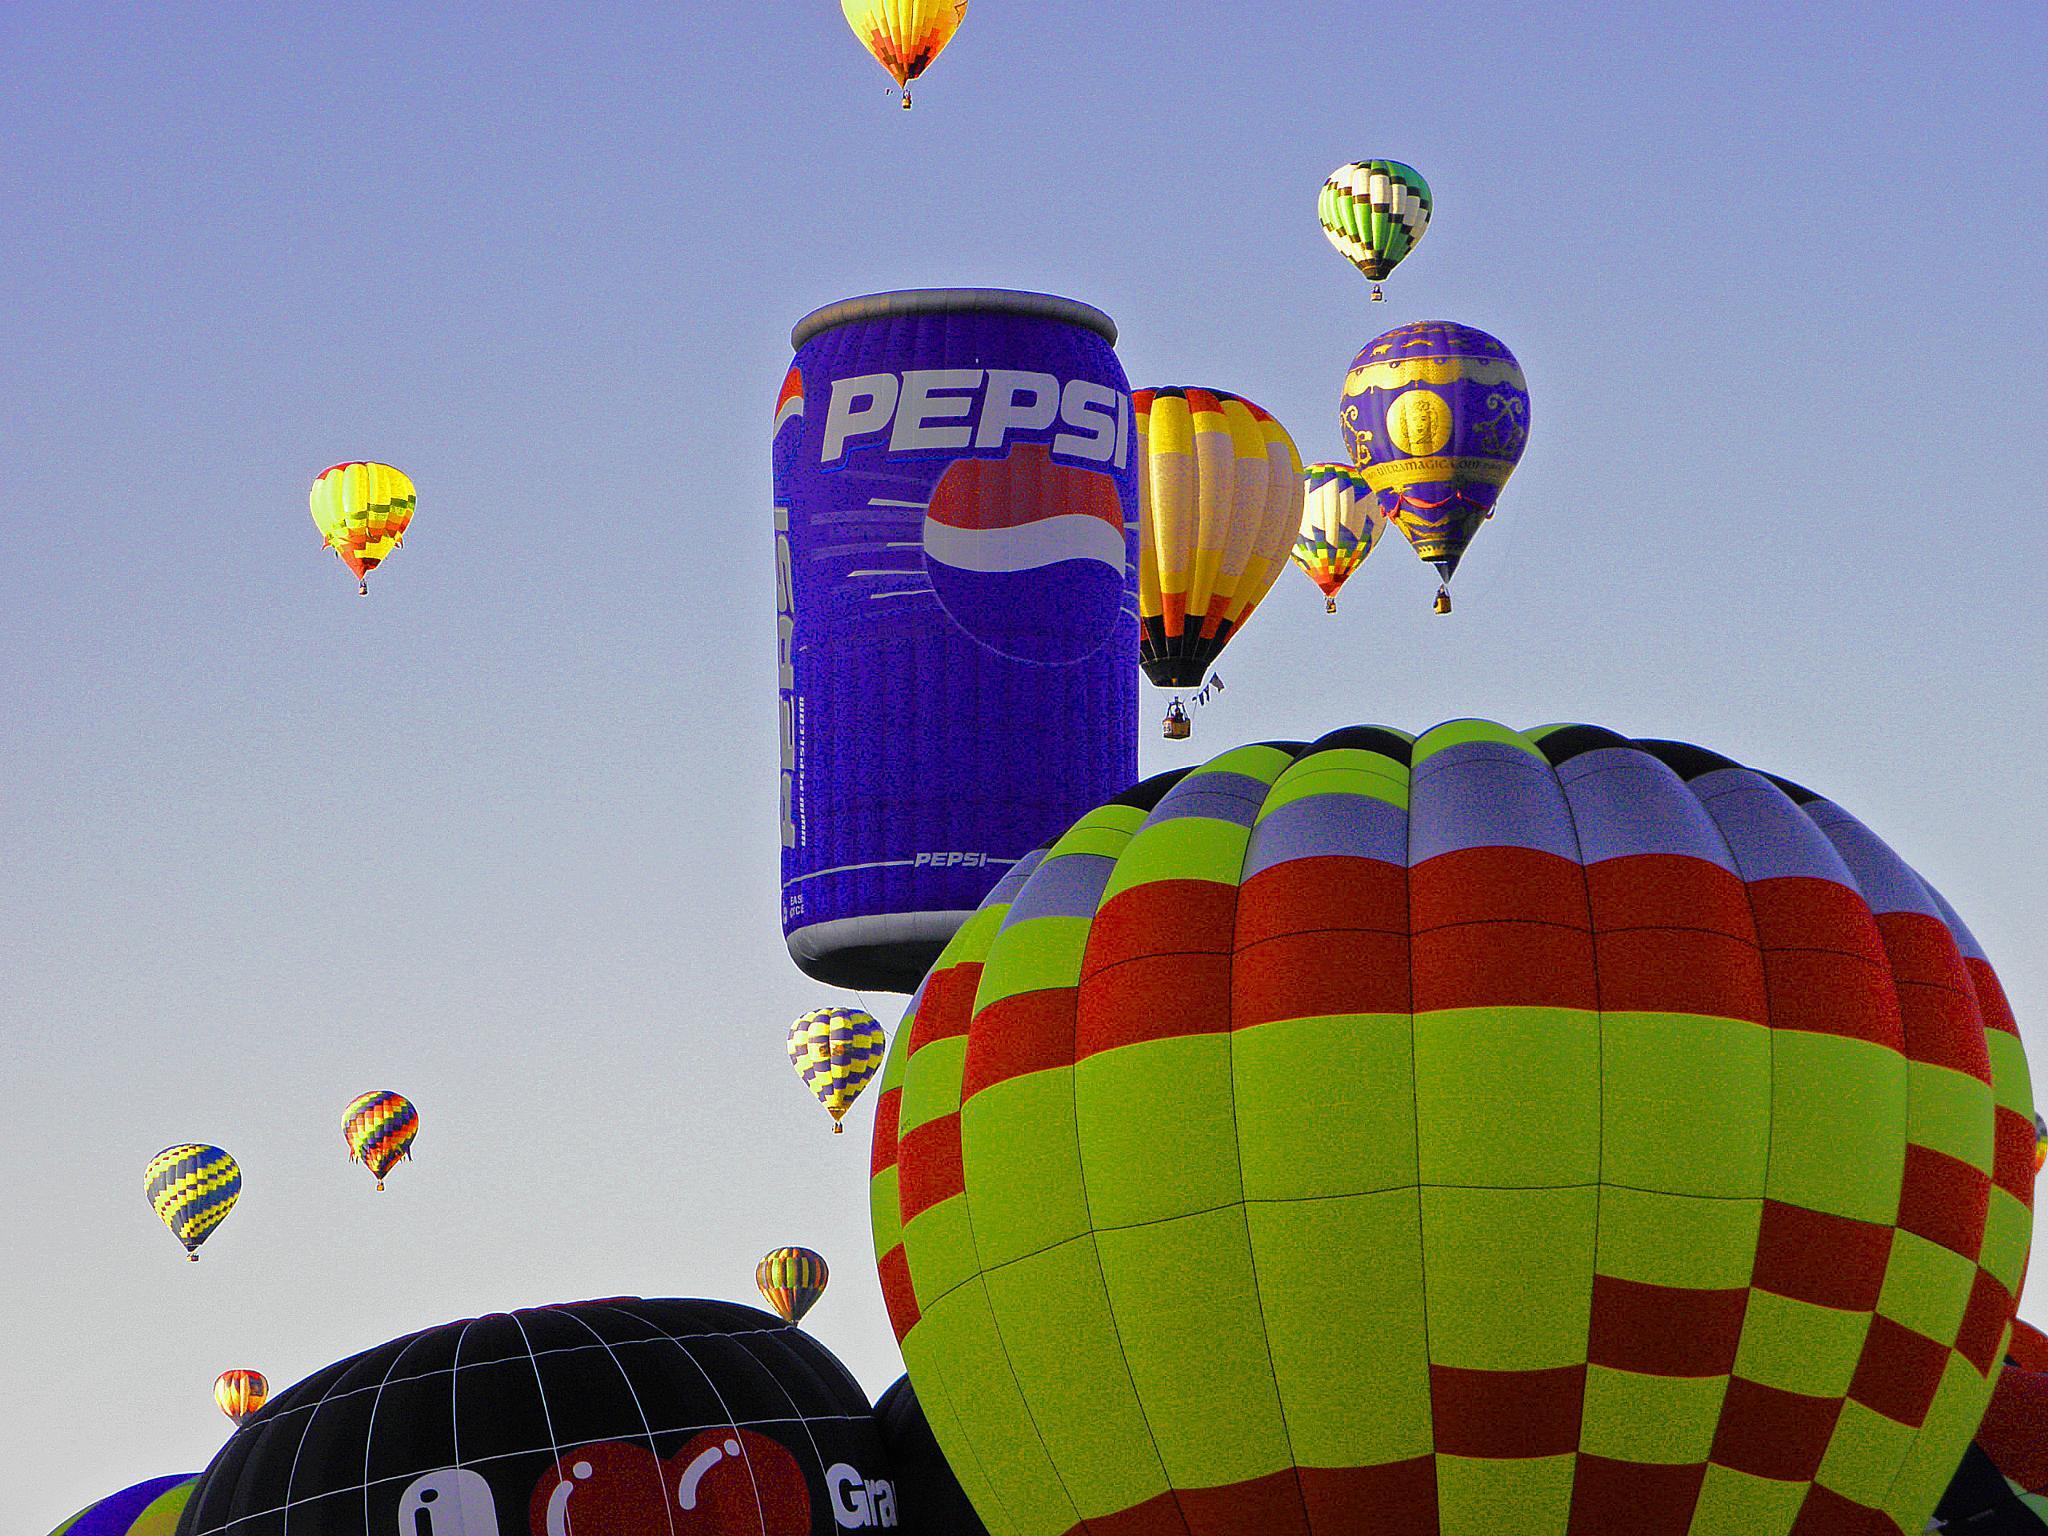 Pepsi in the sky. by Boonietunes